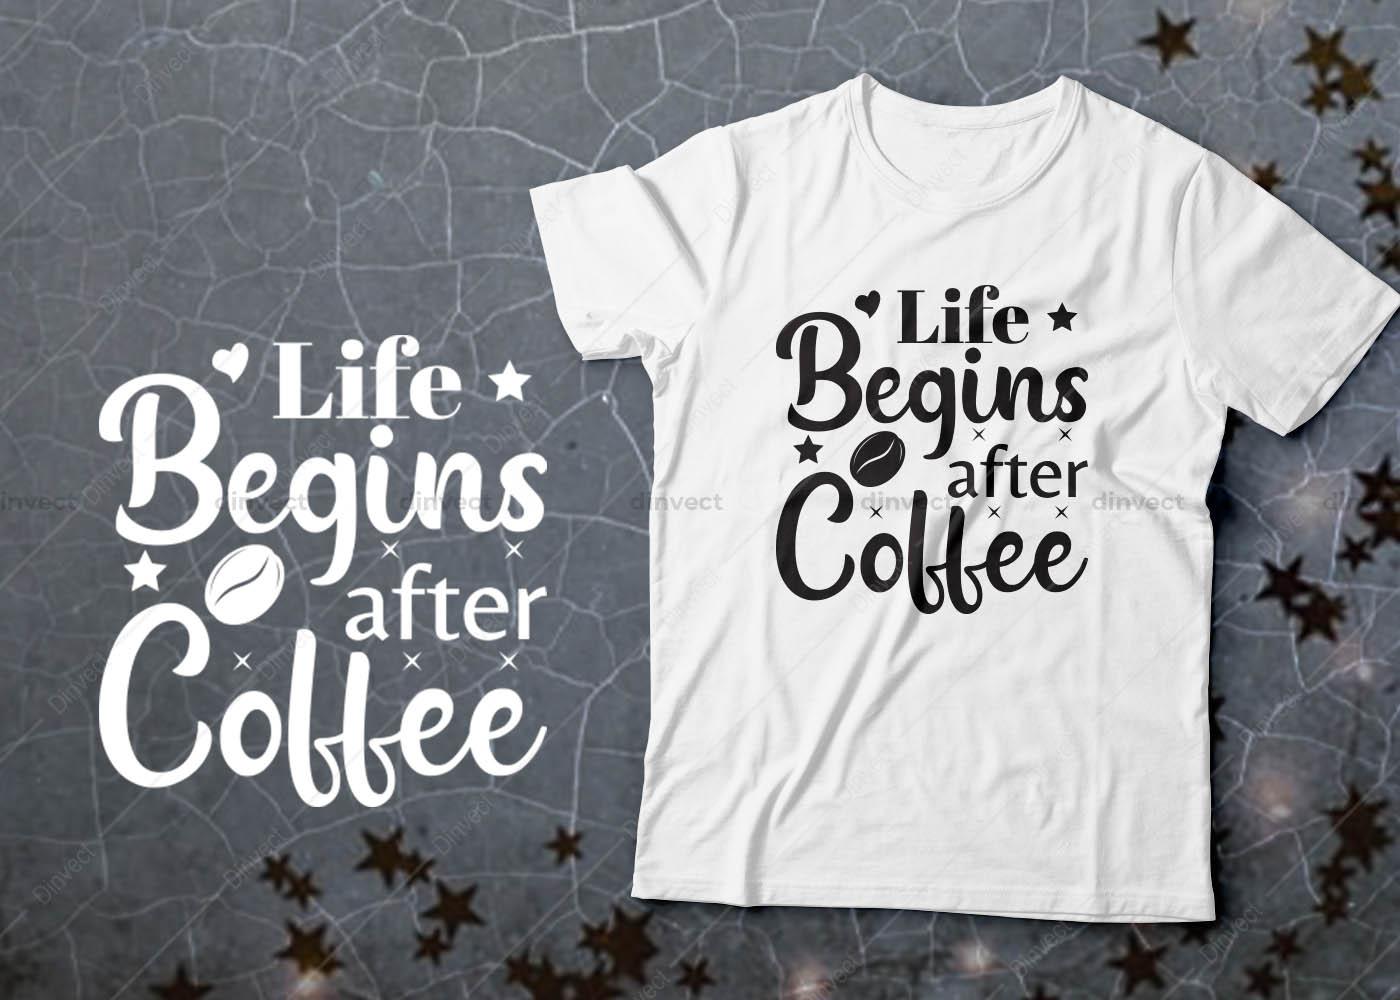 Coffee SVG, Coffee Bundle Svg, Coffee Mug Svg, Funny Coffee Quotes SVG, Mug Design Svg, Coffee Quote - Coffee 4 -